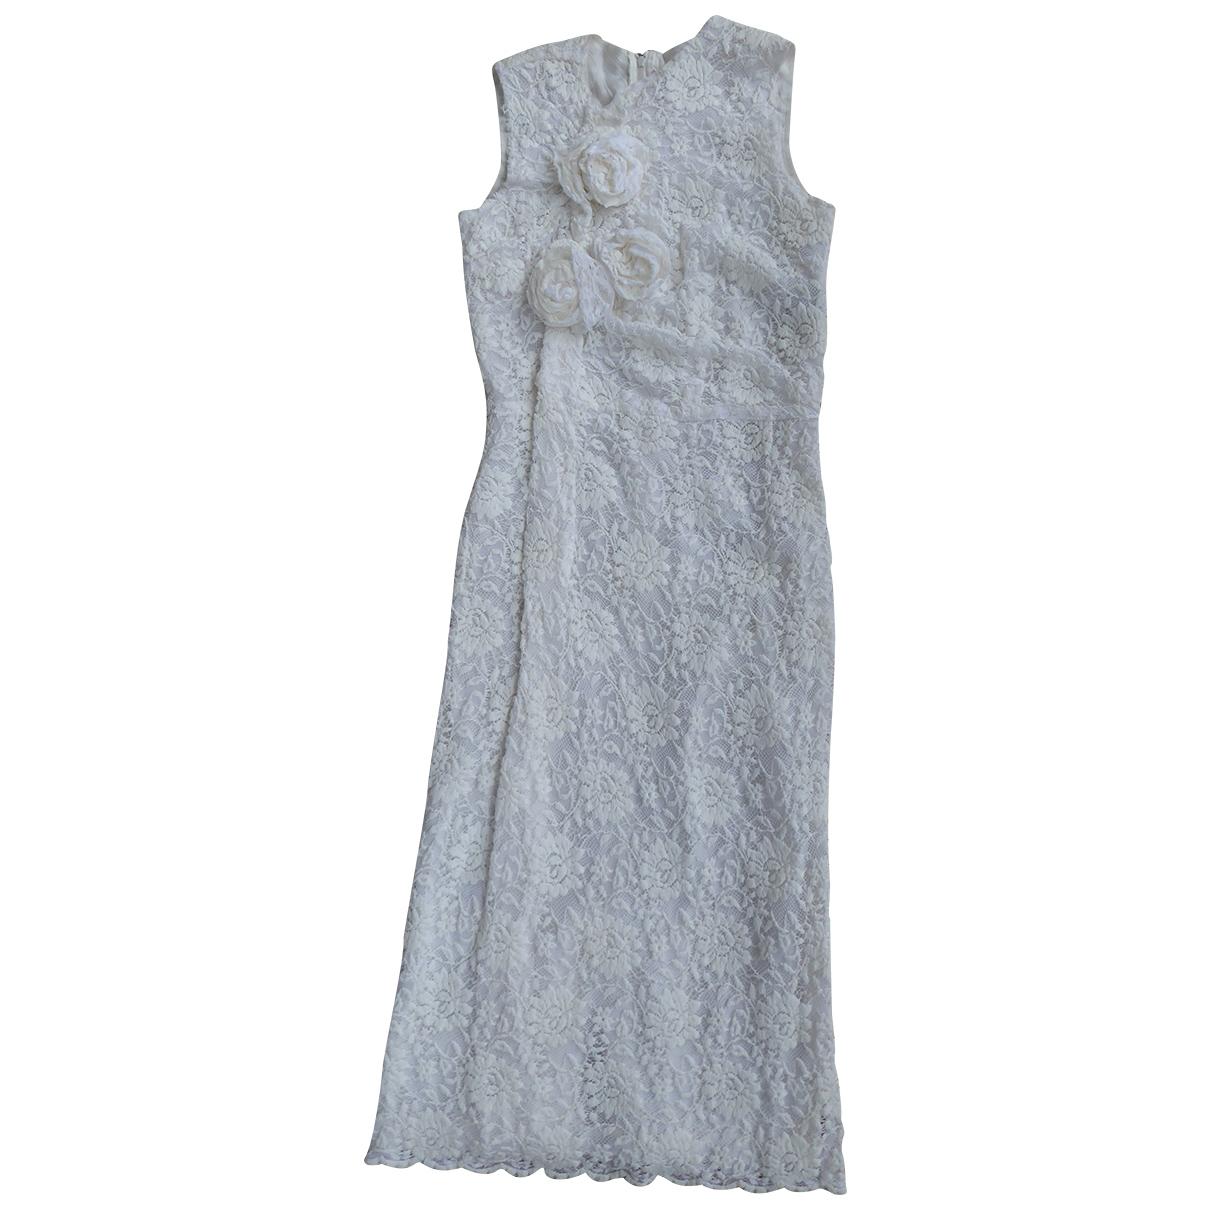 Comme Des Garcons \N White Cotton dress for Women S International